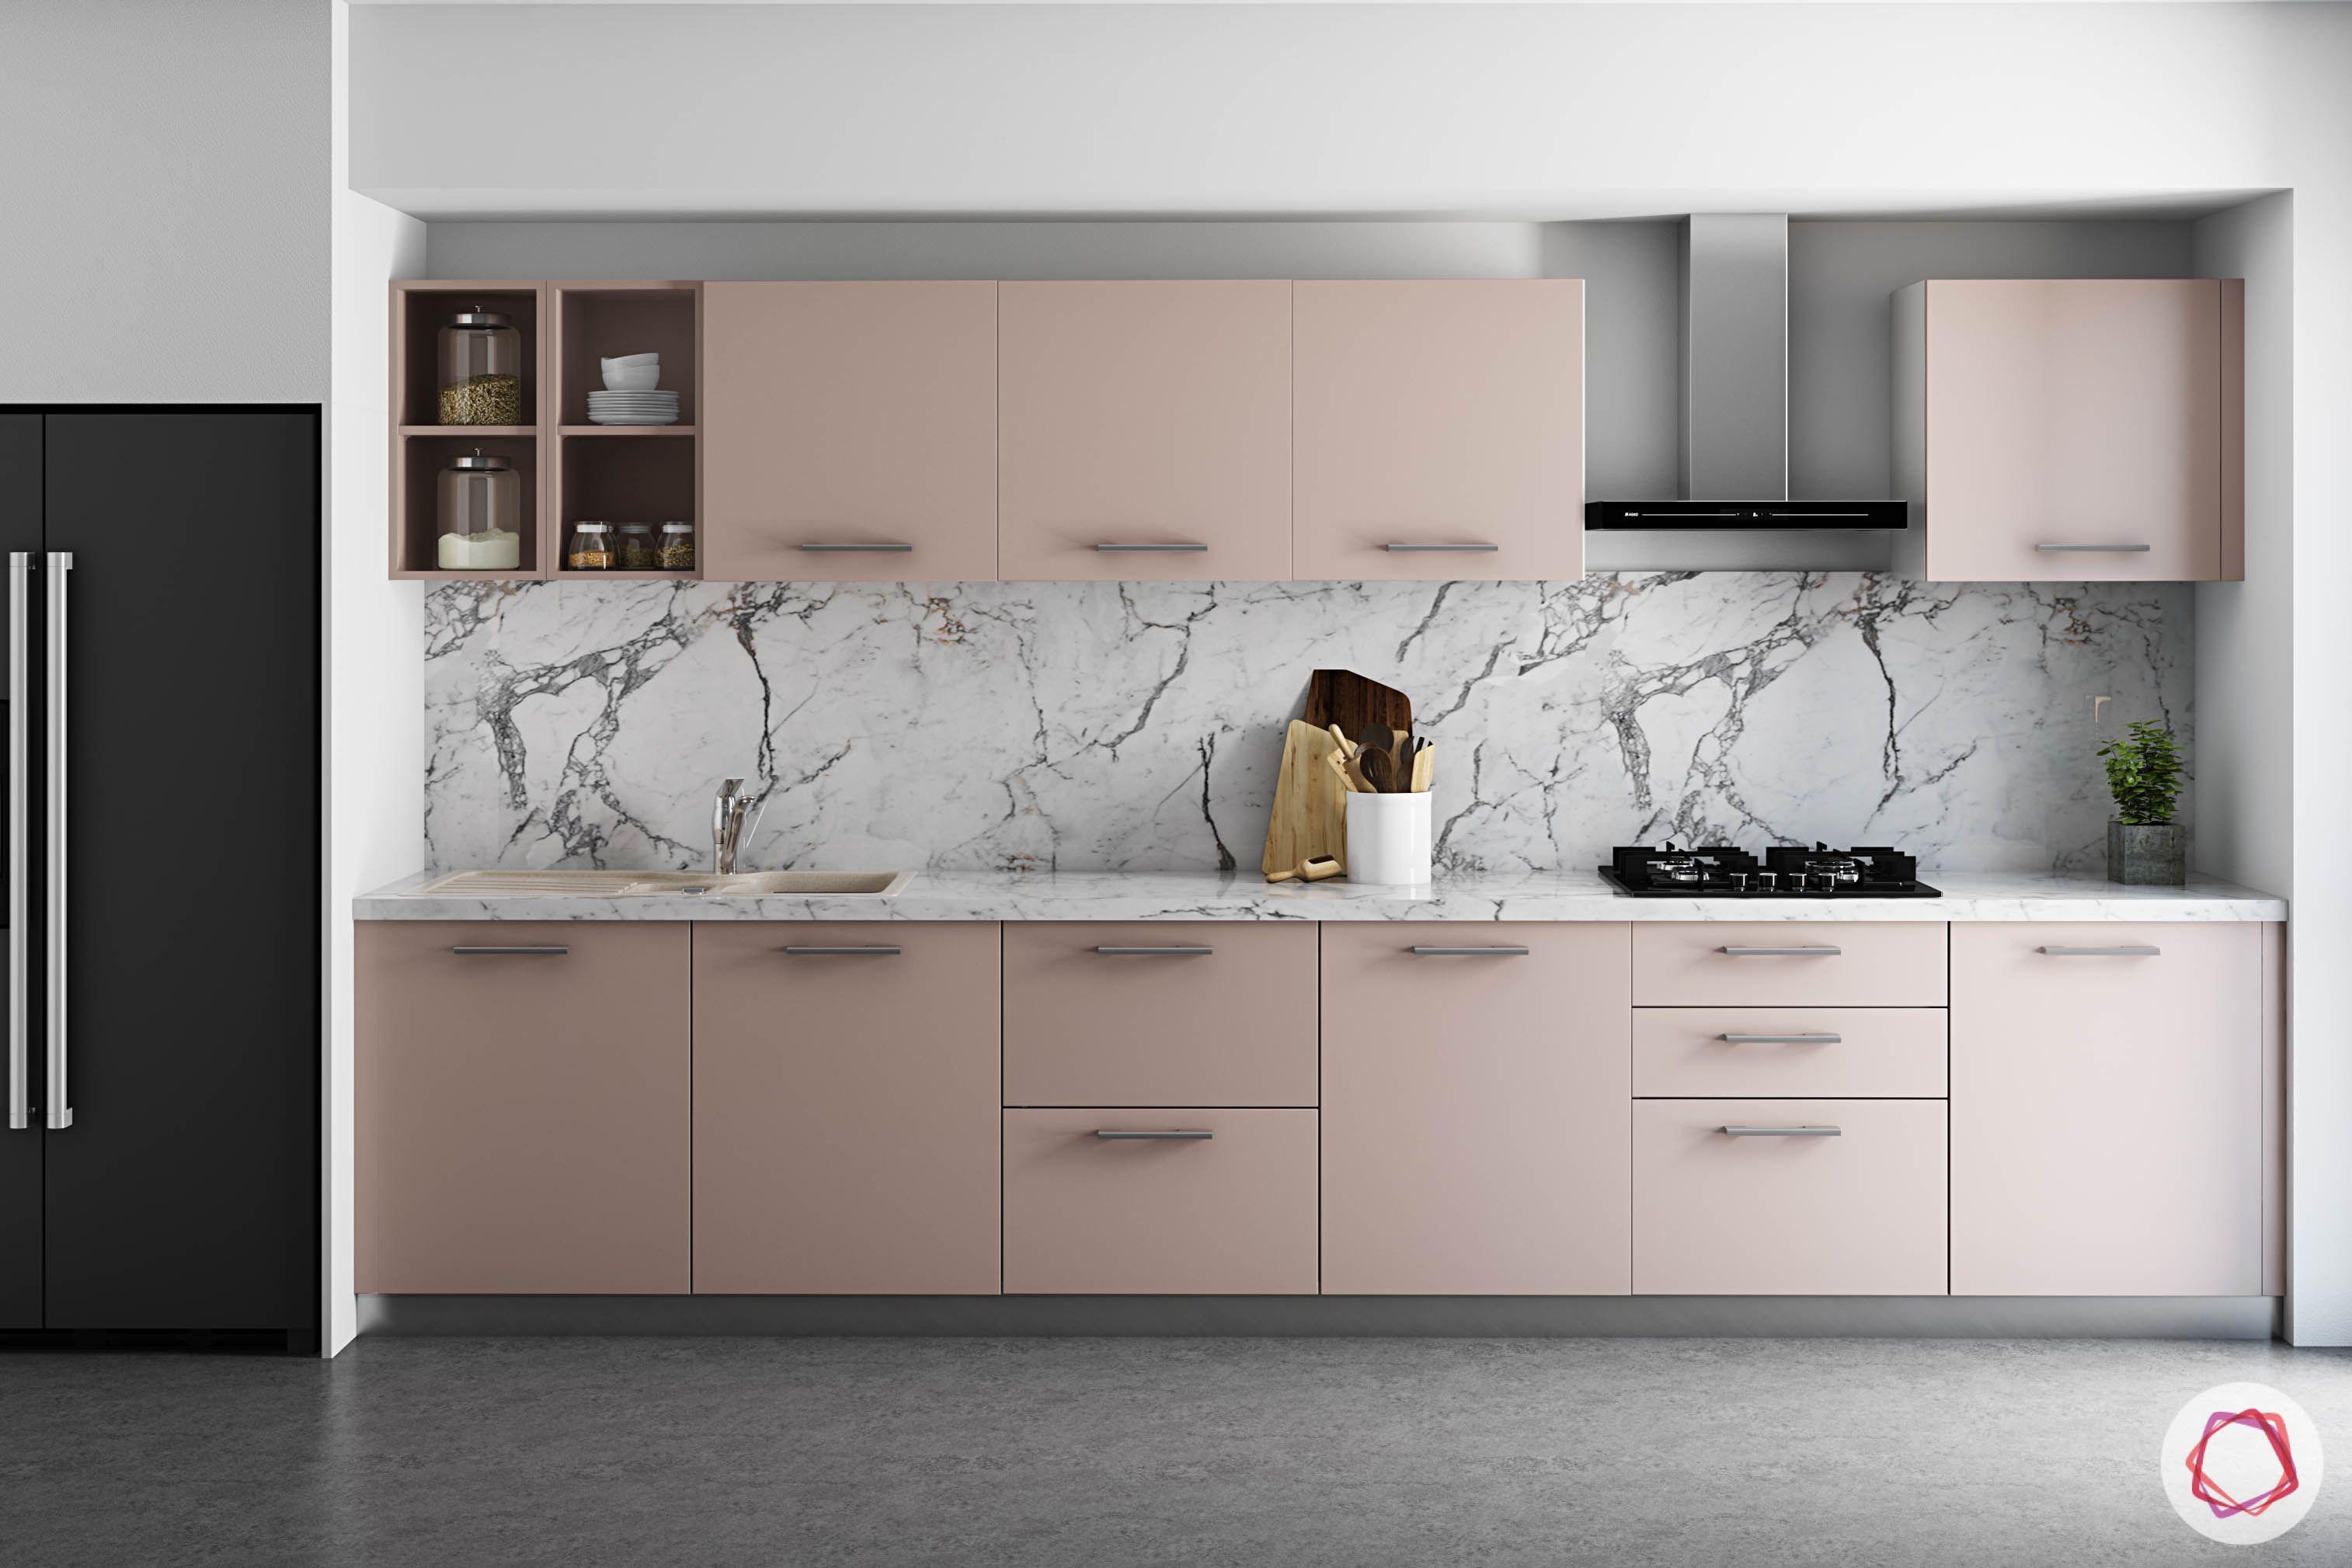 wall-tiles-design-laminam-backsplash-pink-cabinets-fridge-modern